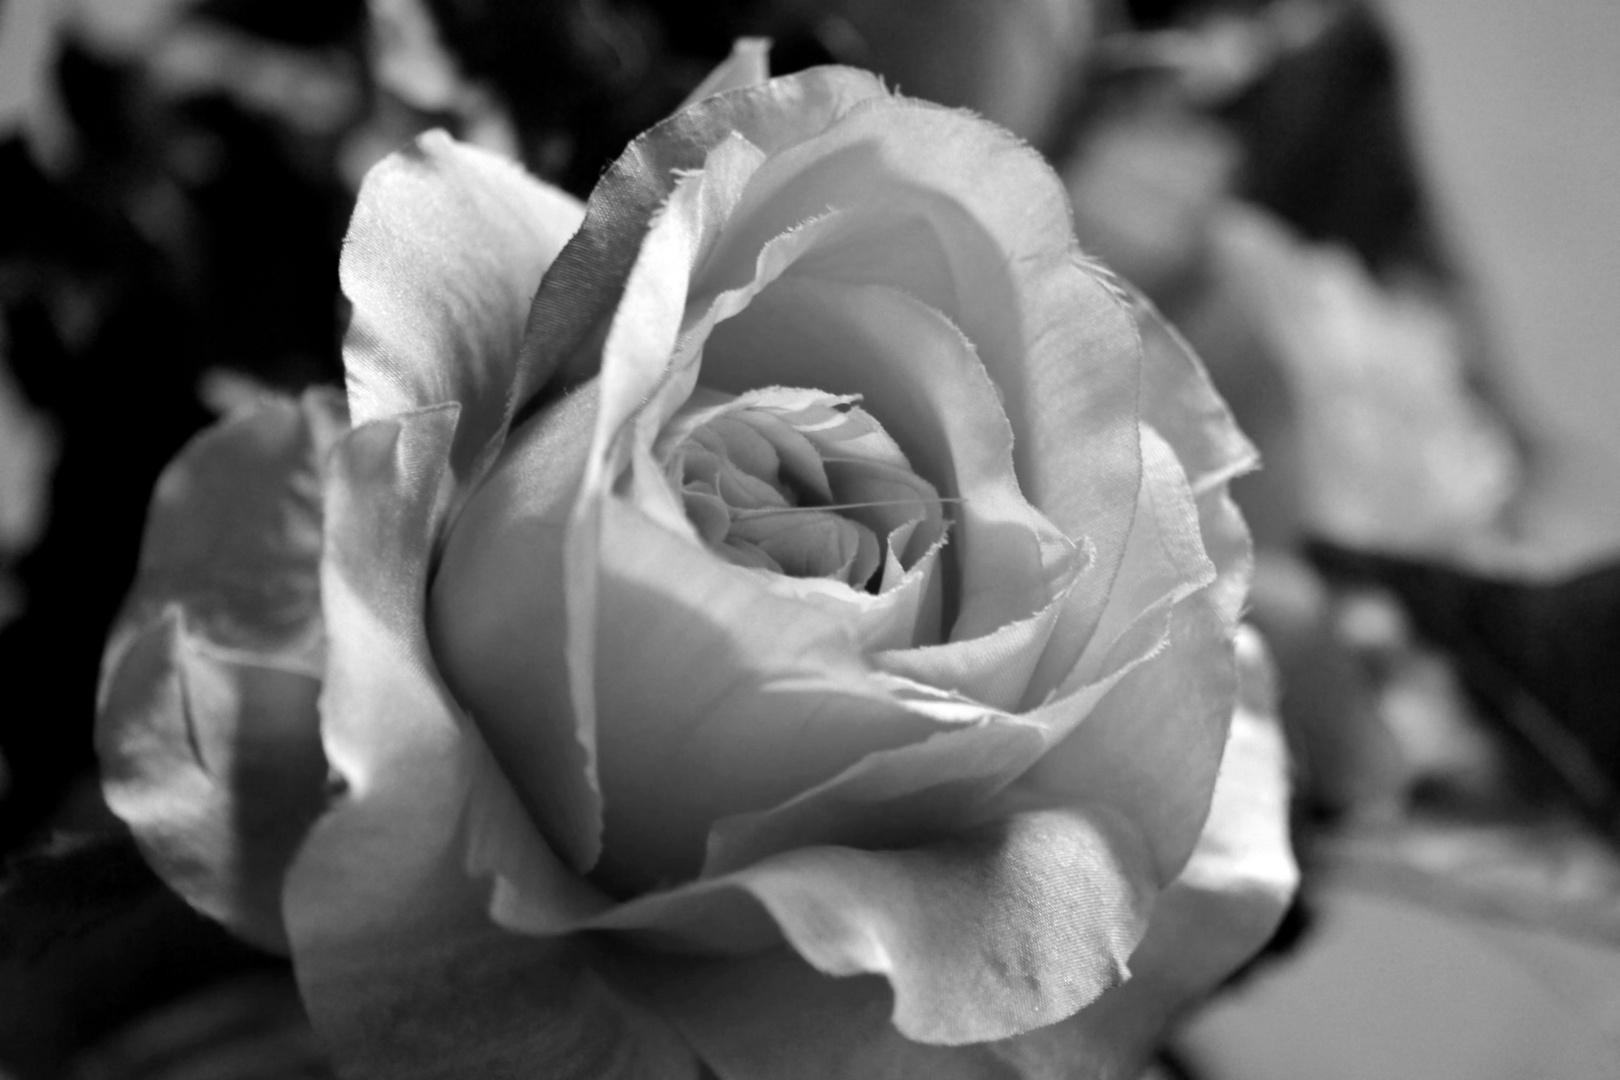 rose in schwarz wei foto bild pflanzen pilze flechten bl ten kleinpflanzen rosen. Black Bedroom Furniture Sets. Home Design Ideas